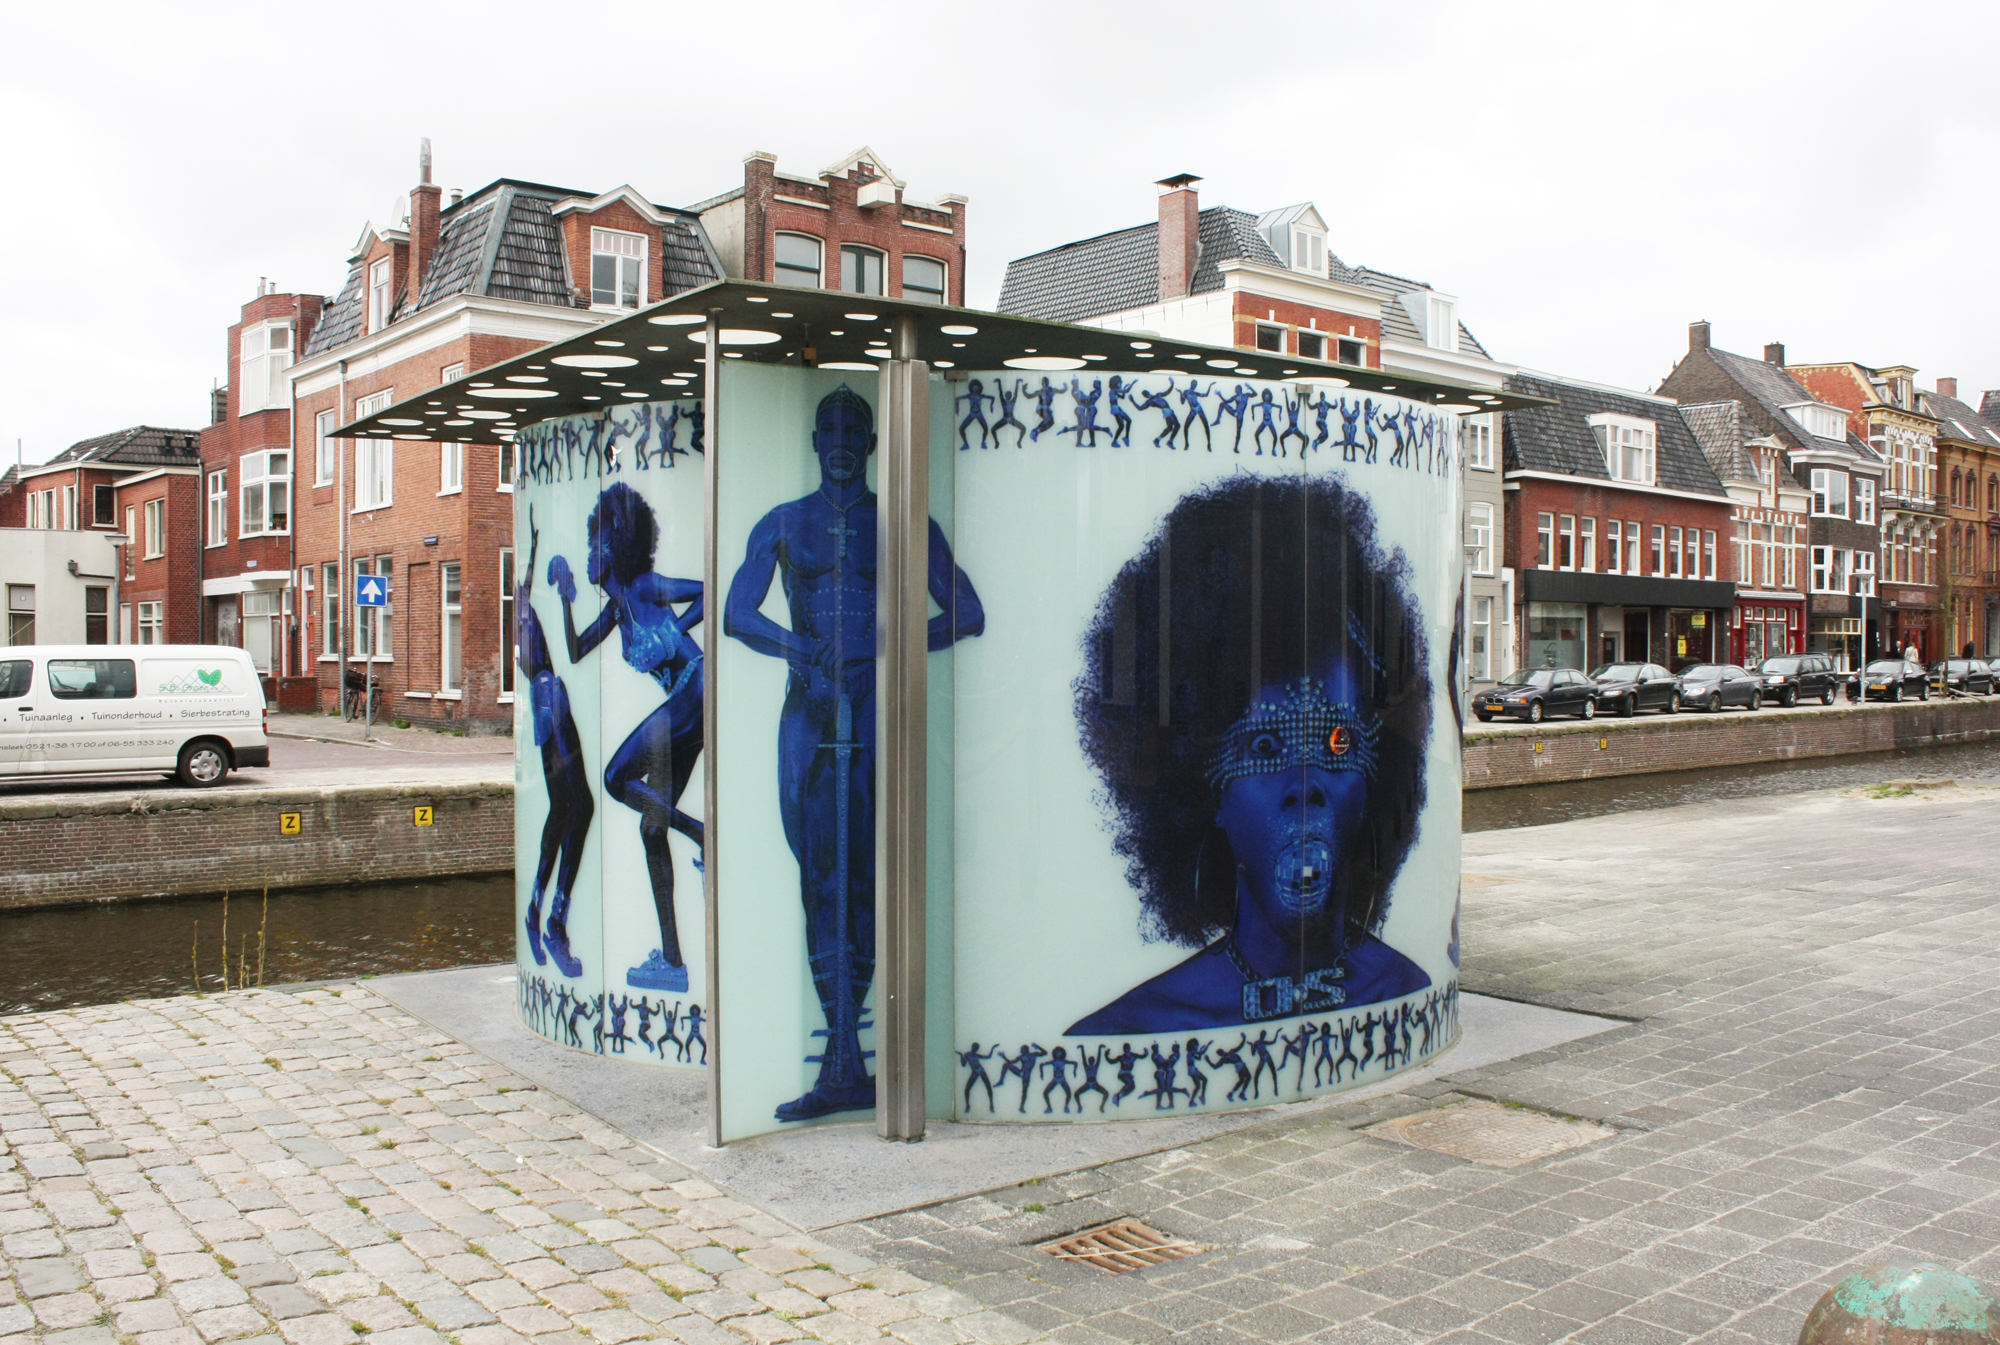 urbanbacklog-groningen-public-toilet-1.jpg